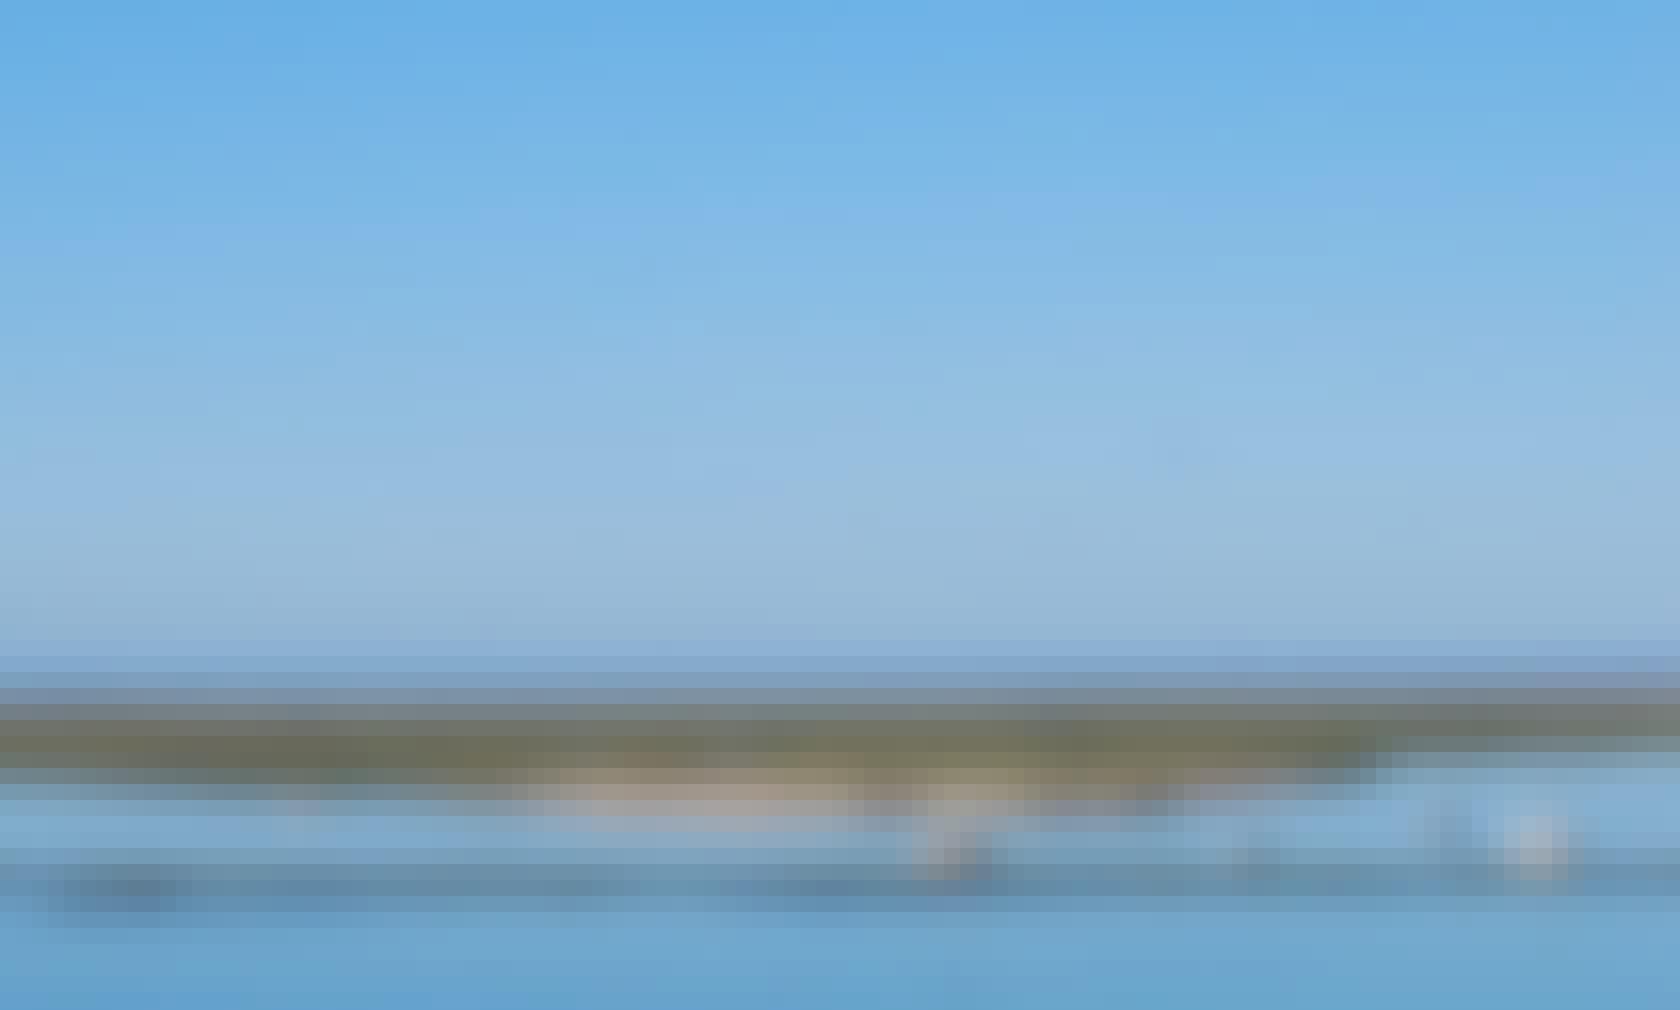 Algarve Eco-friendly Solar Boat Trip in Ria Formosa from Faro